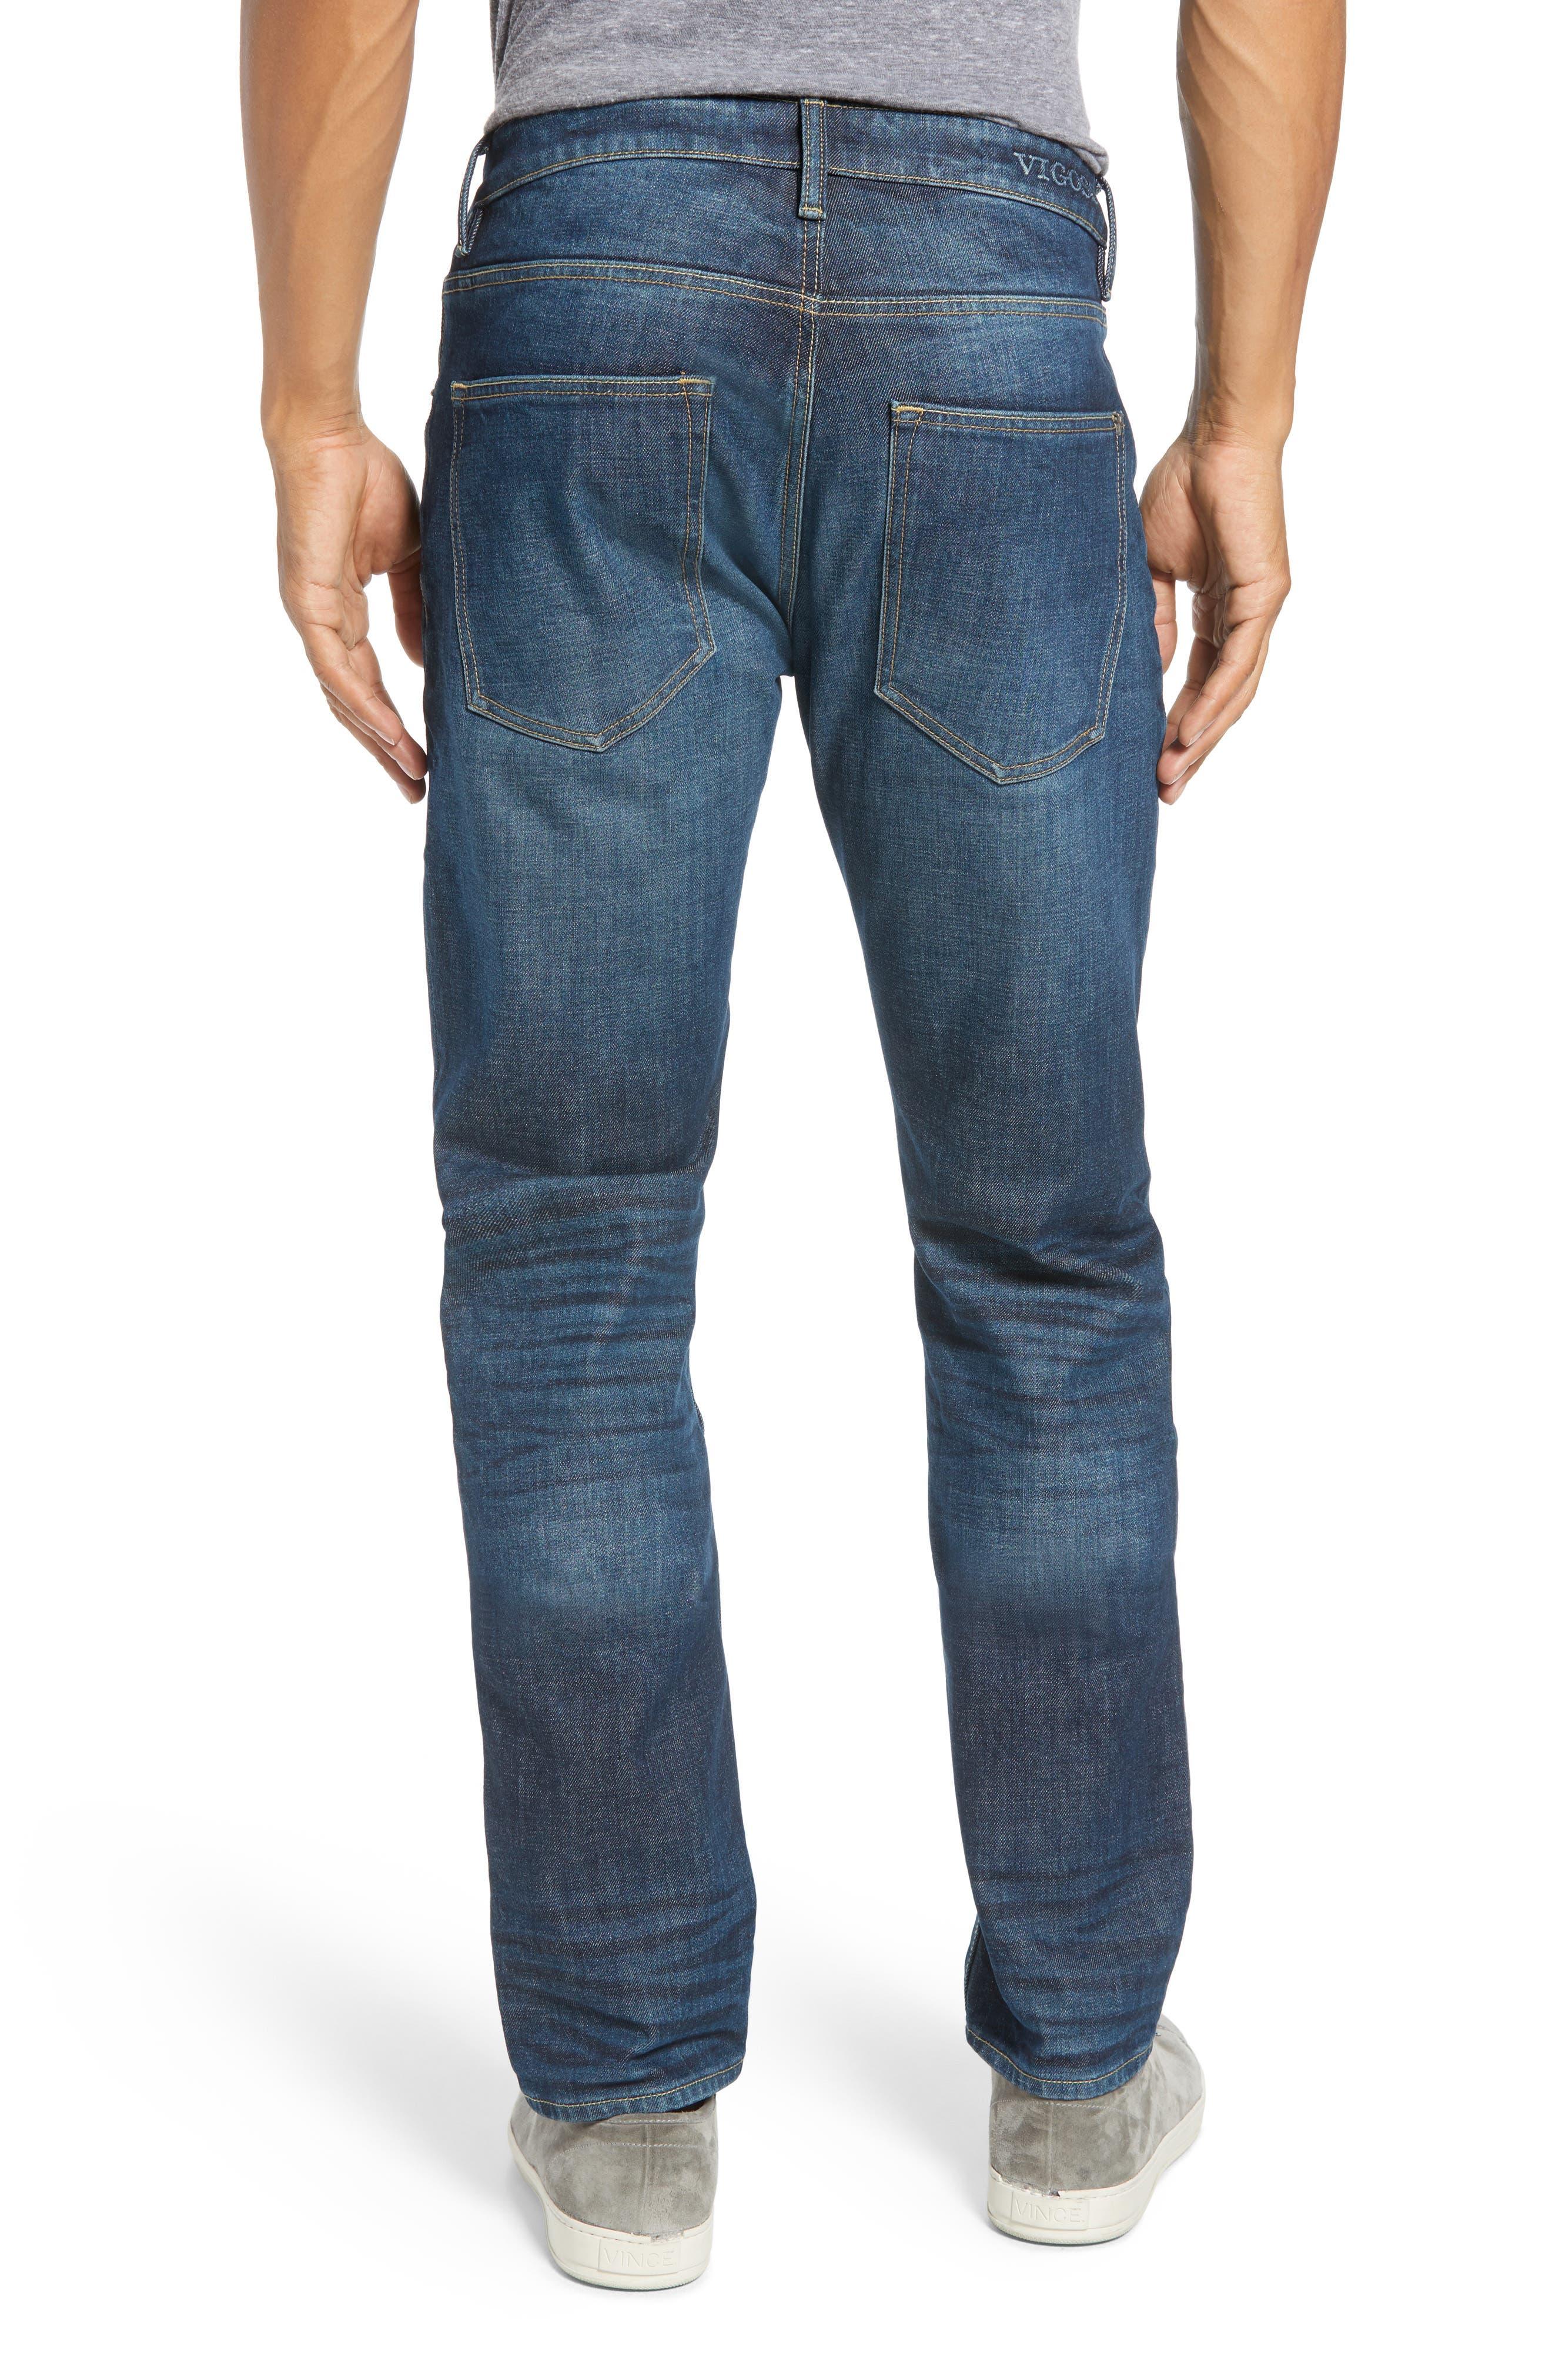 Mick Slim Fit Jeans,                             Alternate thumbnail 2, color,                             DARK 3D WASH